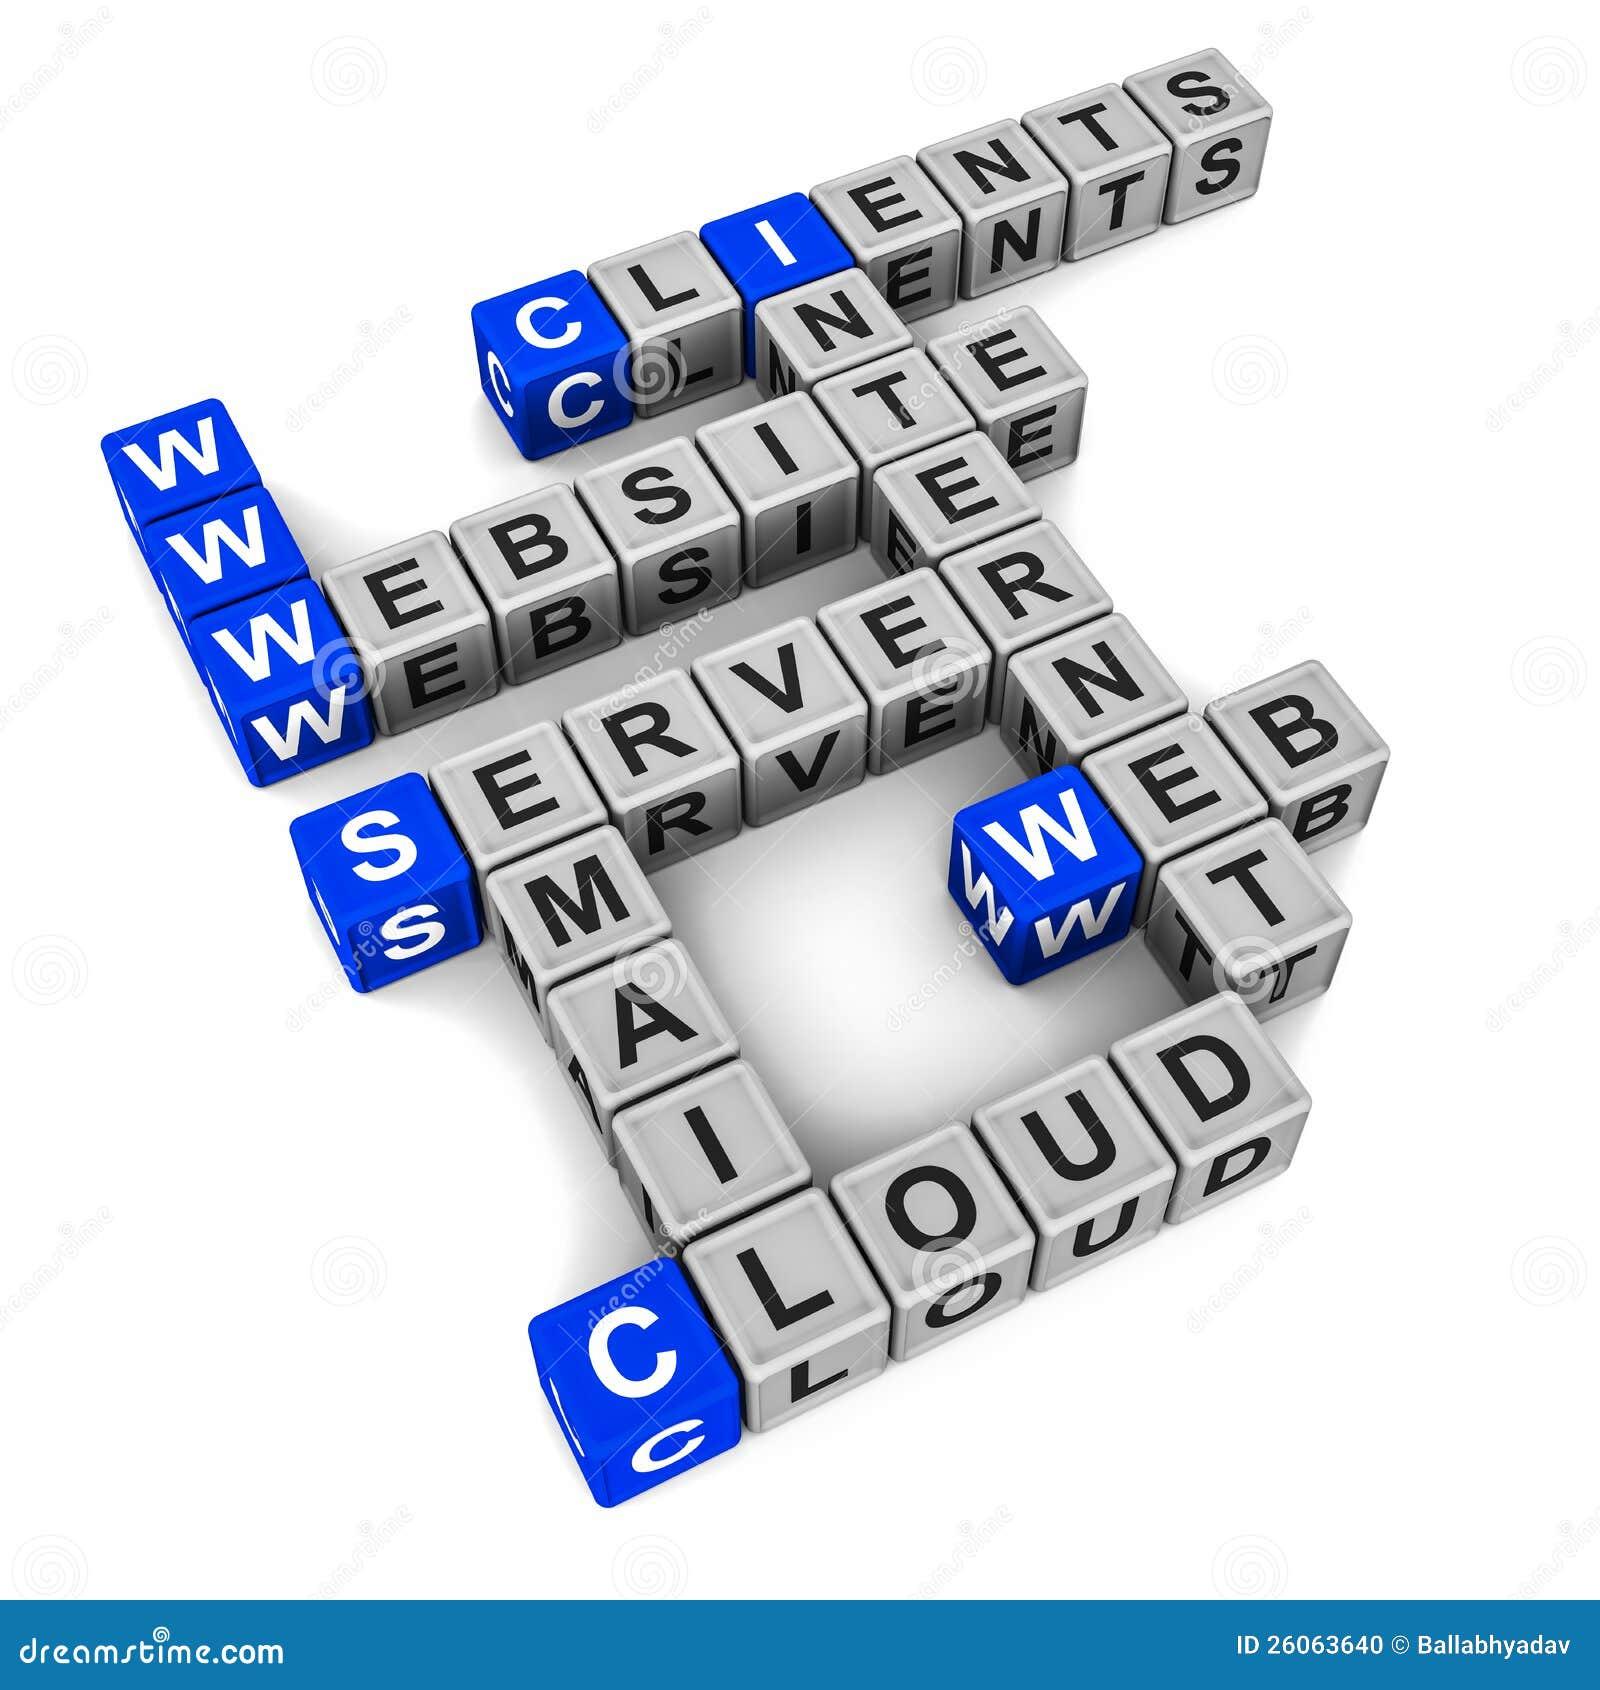 www-internet-applications-26063640.jpg